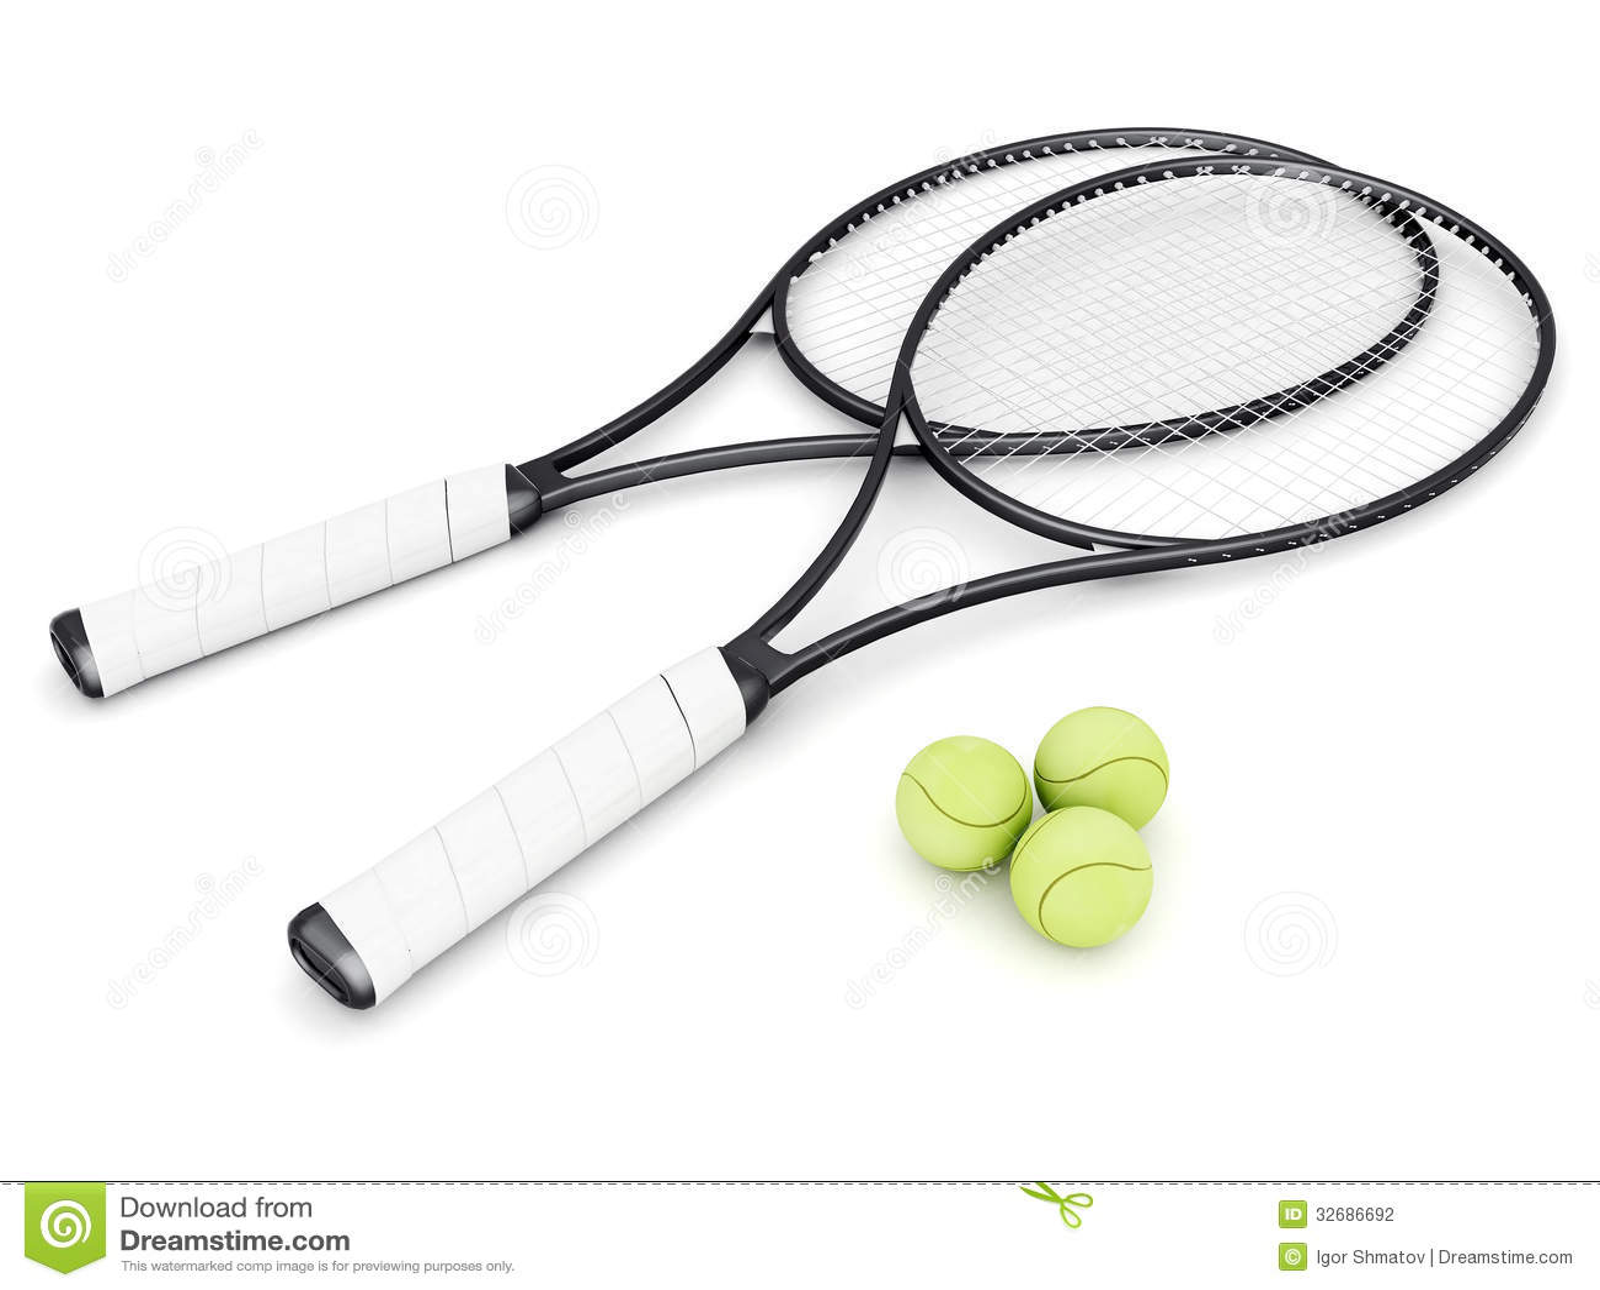 reputable site cdaad c965e Tennisausrüstung stock abbildung. Illustration von kugel ...